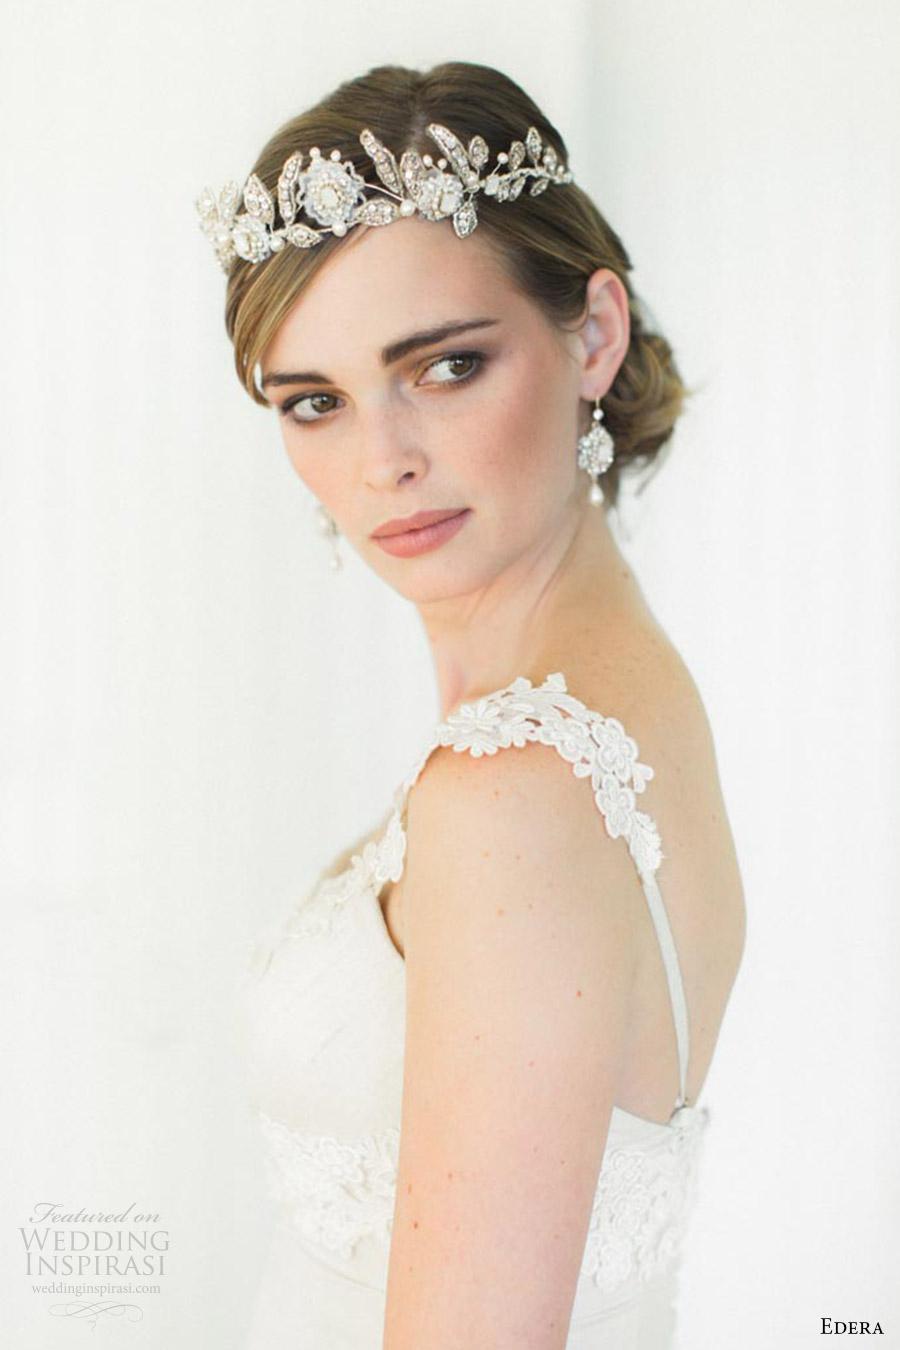 edera jewelry 2016 bridal accessories collection (aquarelle) tiara sv romantic edwardian inspired headpiece